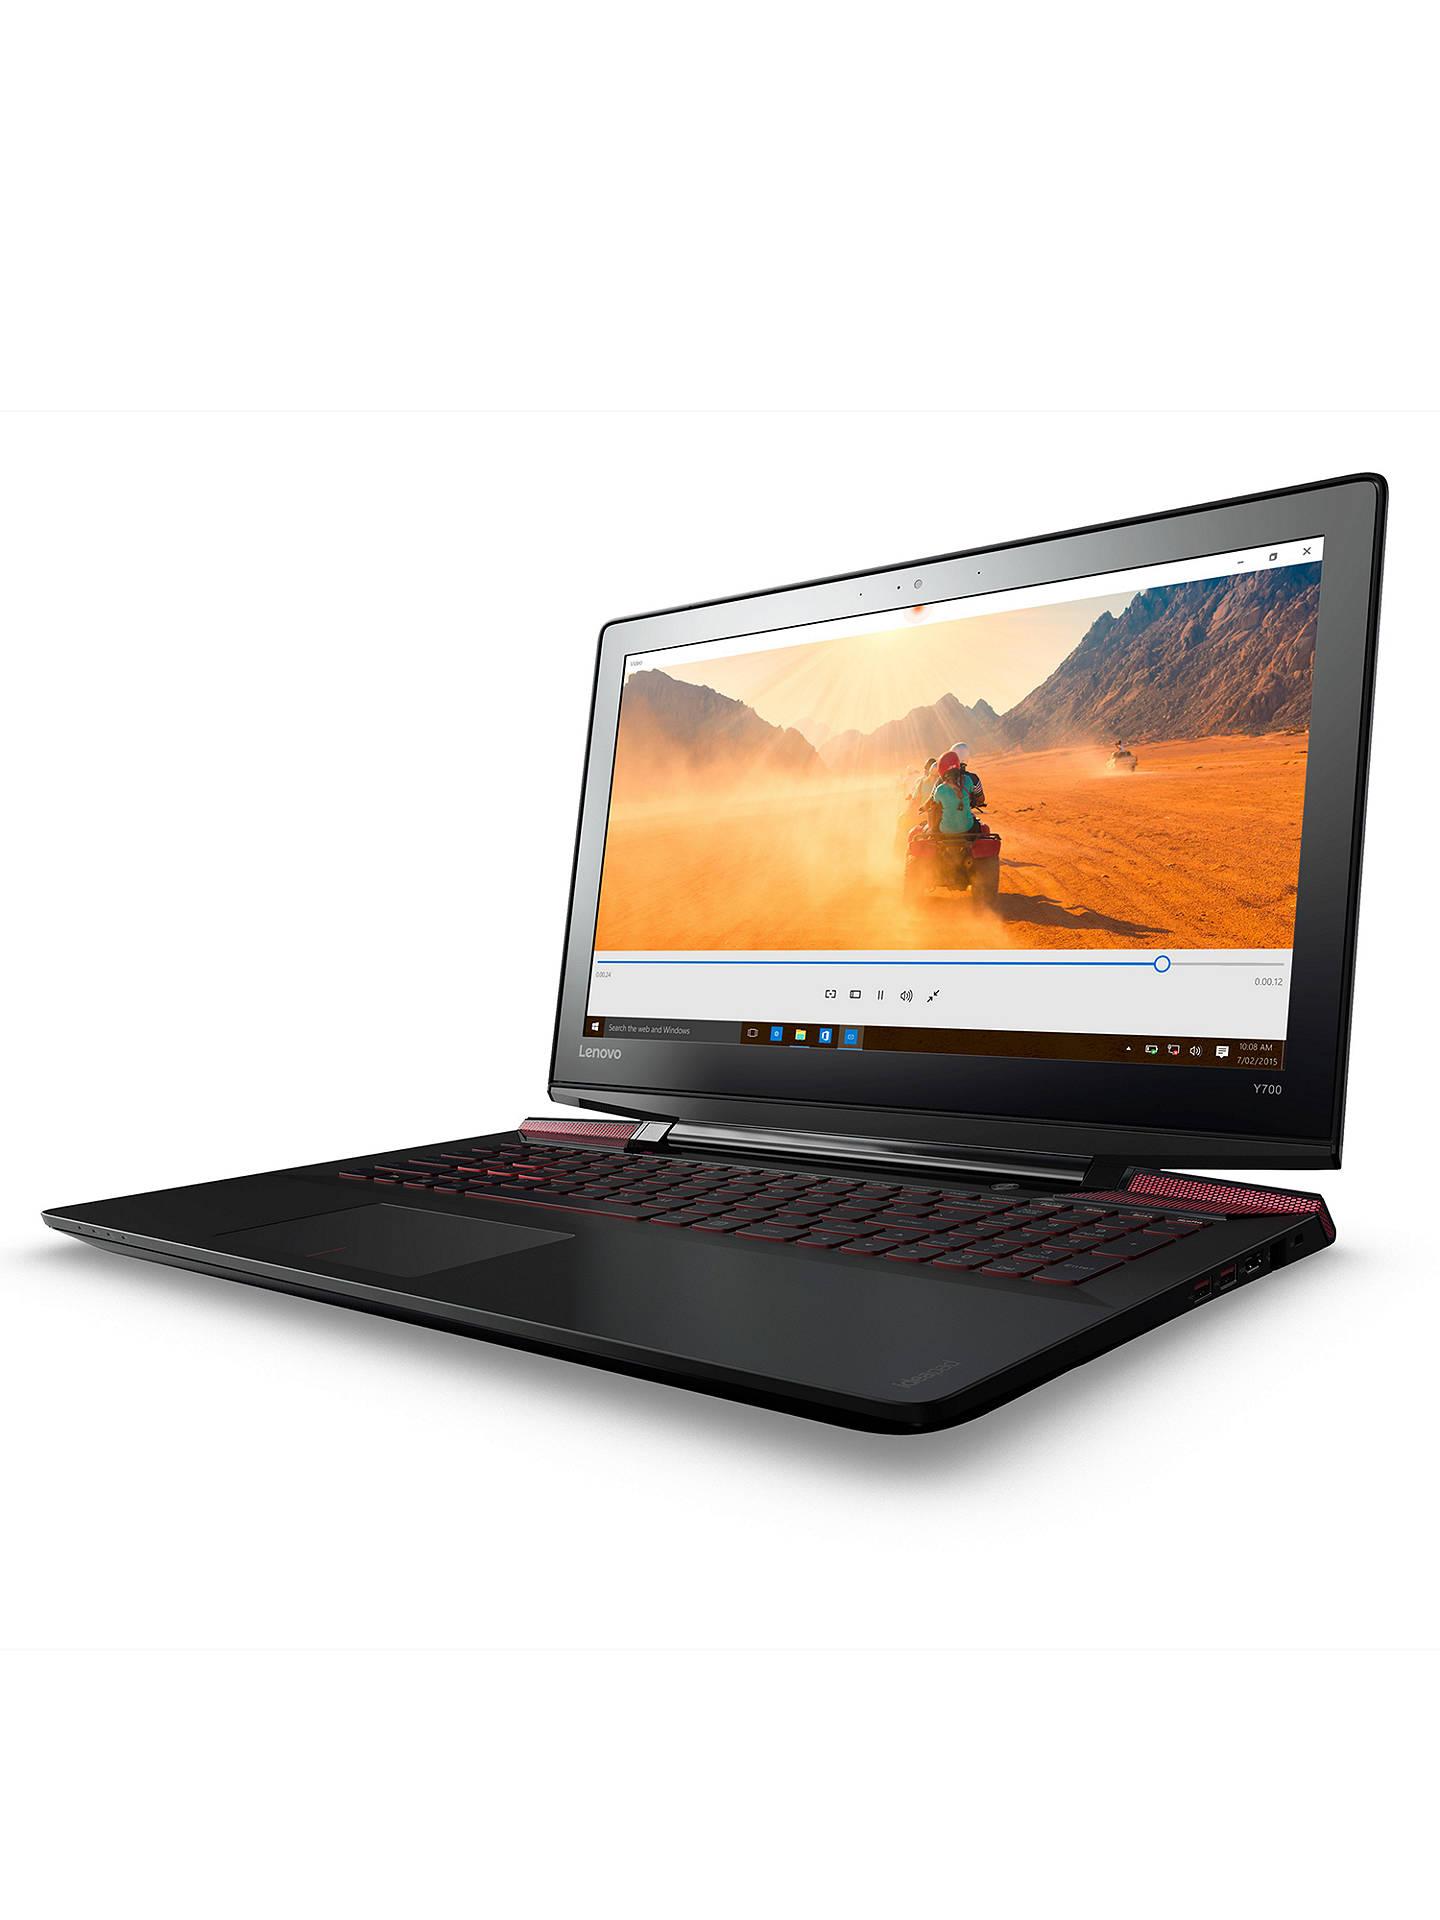 Lenovo Ideapad Y700 Gaming Laptop, Intel Core i7, 16GB RAM, 1TB HDD + 256GB  SSD, NVIDIA GTX 960, 15 6